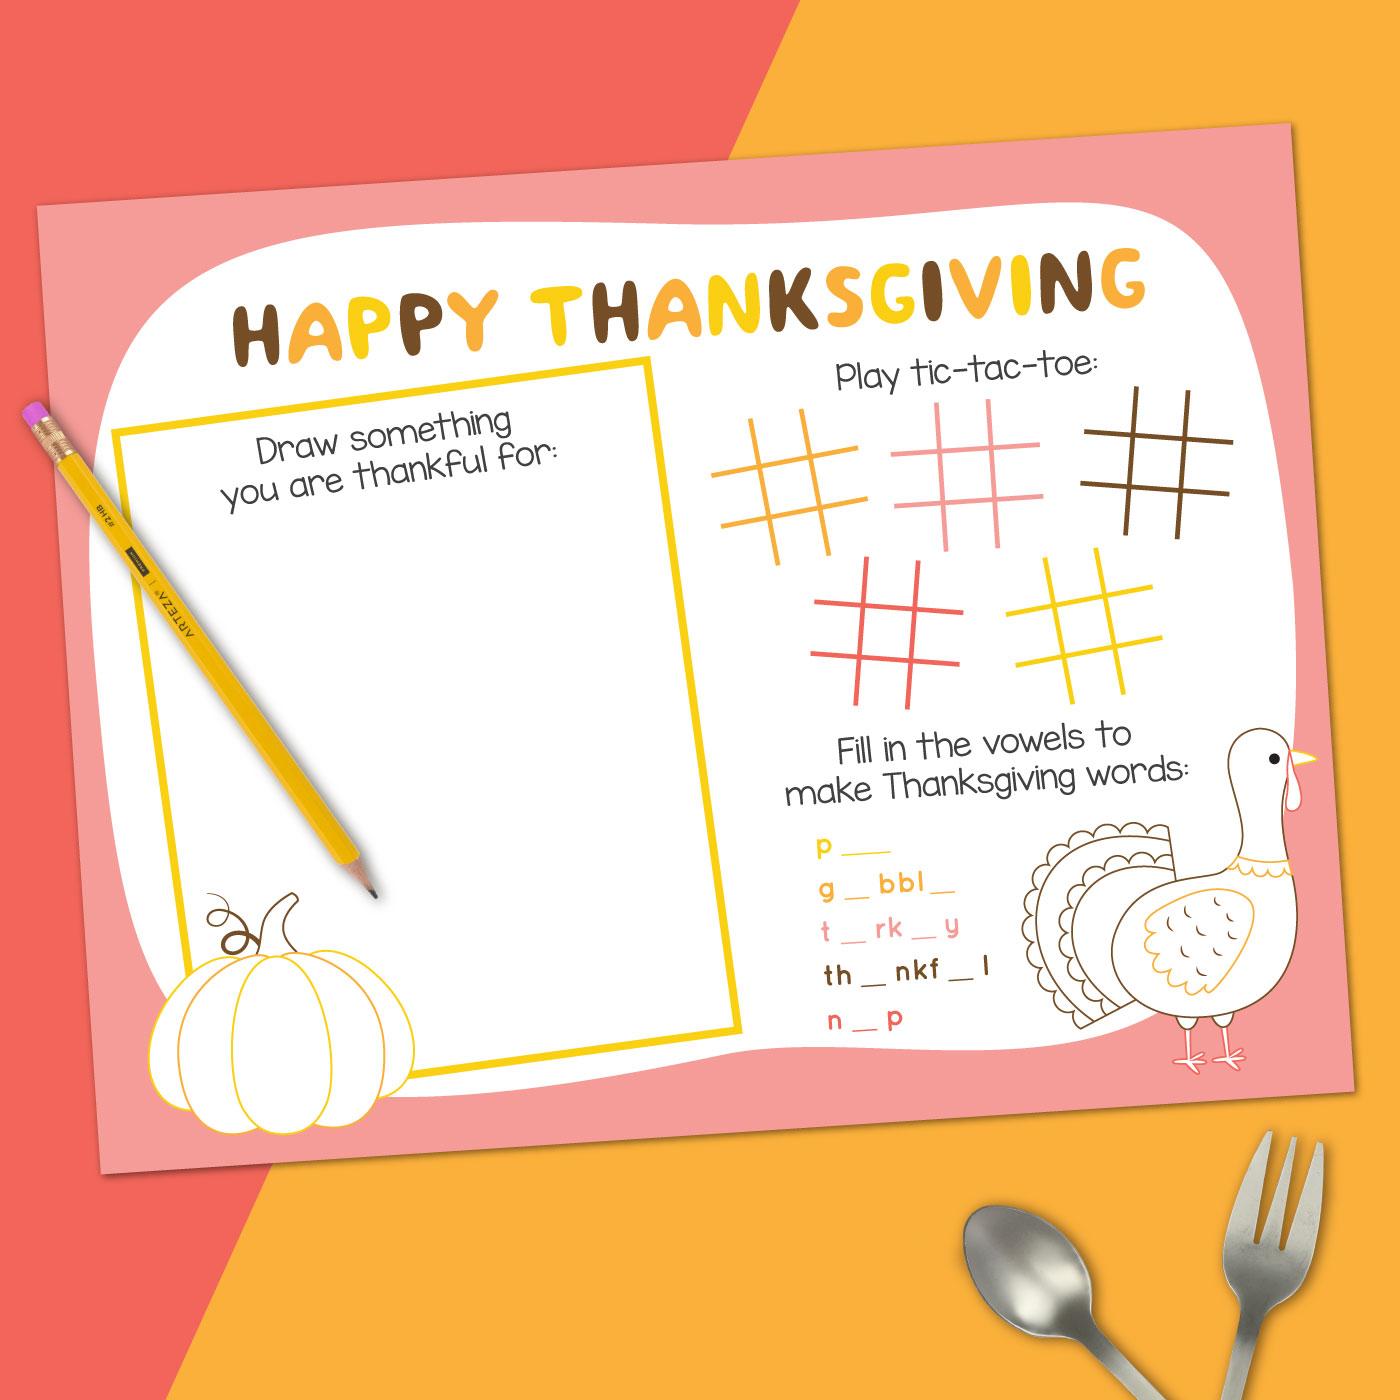 Printable Thanksgiving Placemat mockup